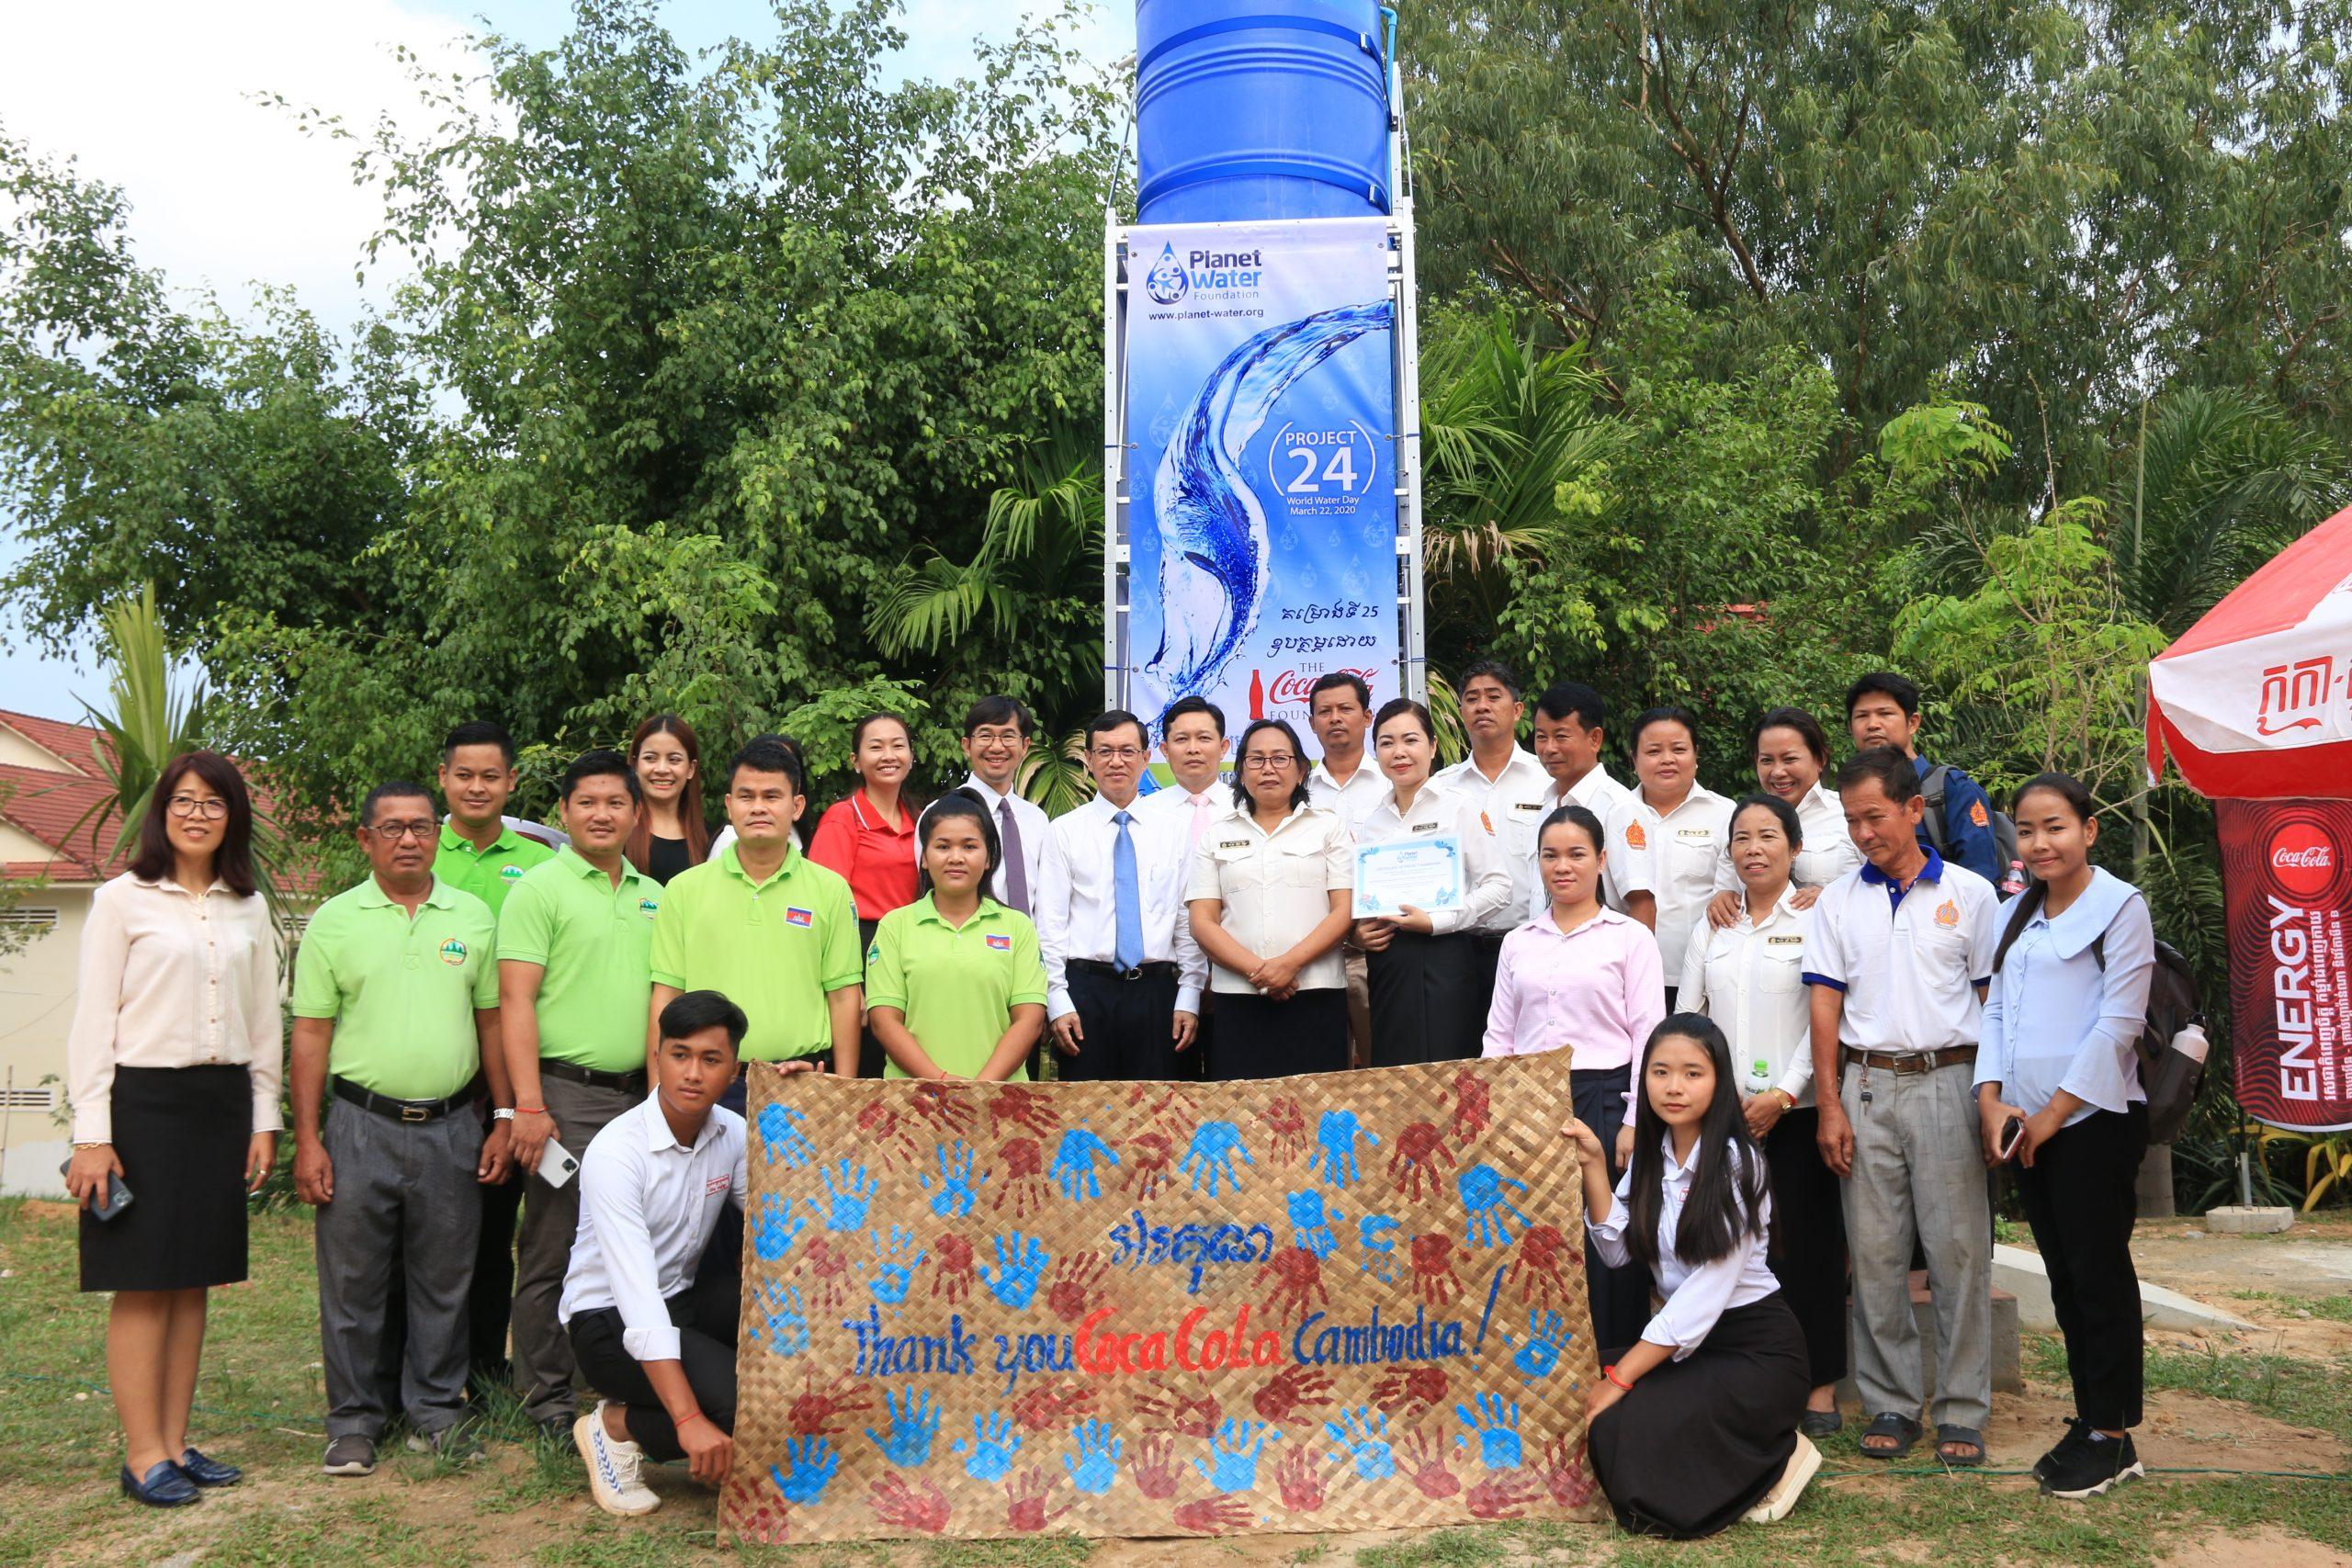 Deploy Water Filtration System-Aquatower at Sihanouk Vile